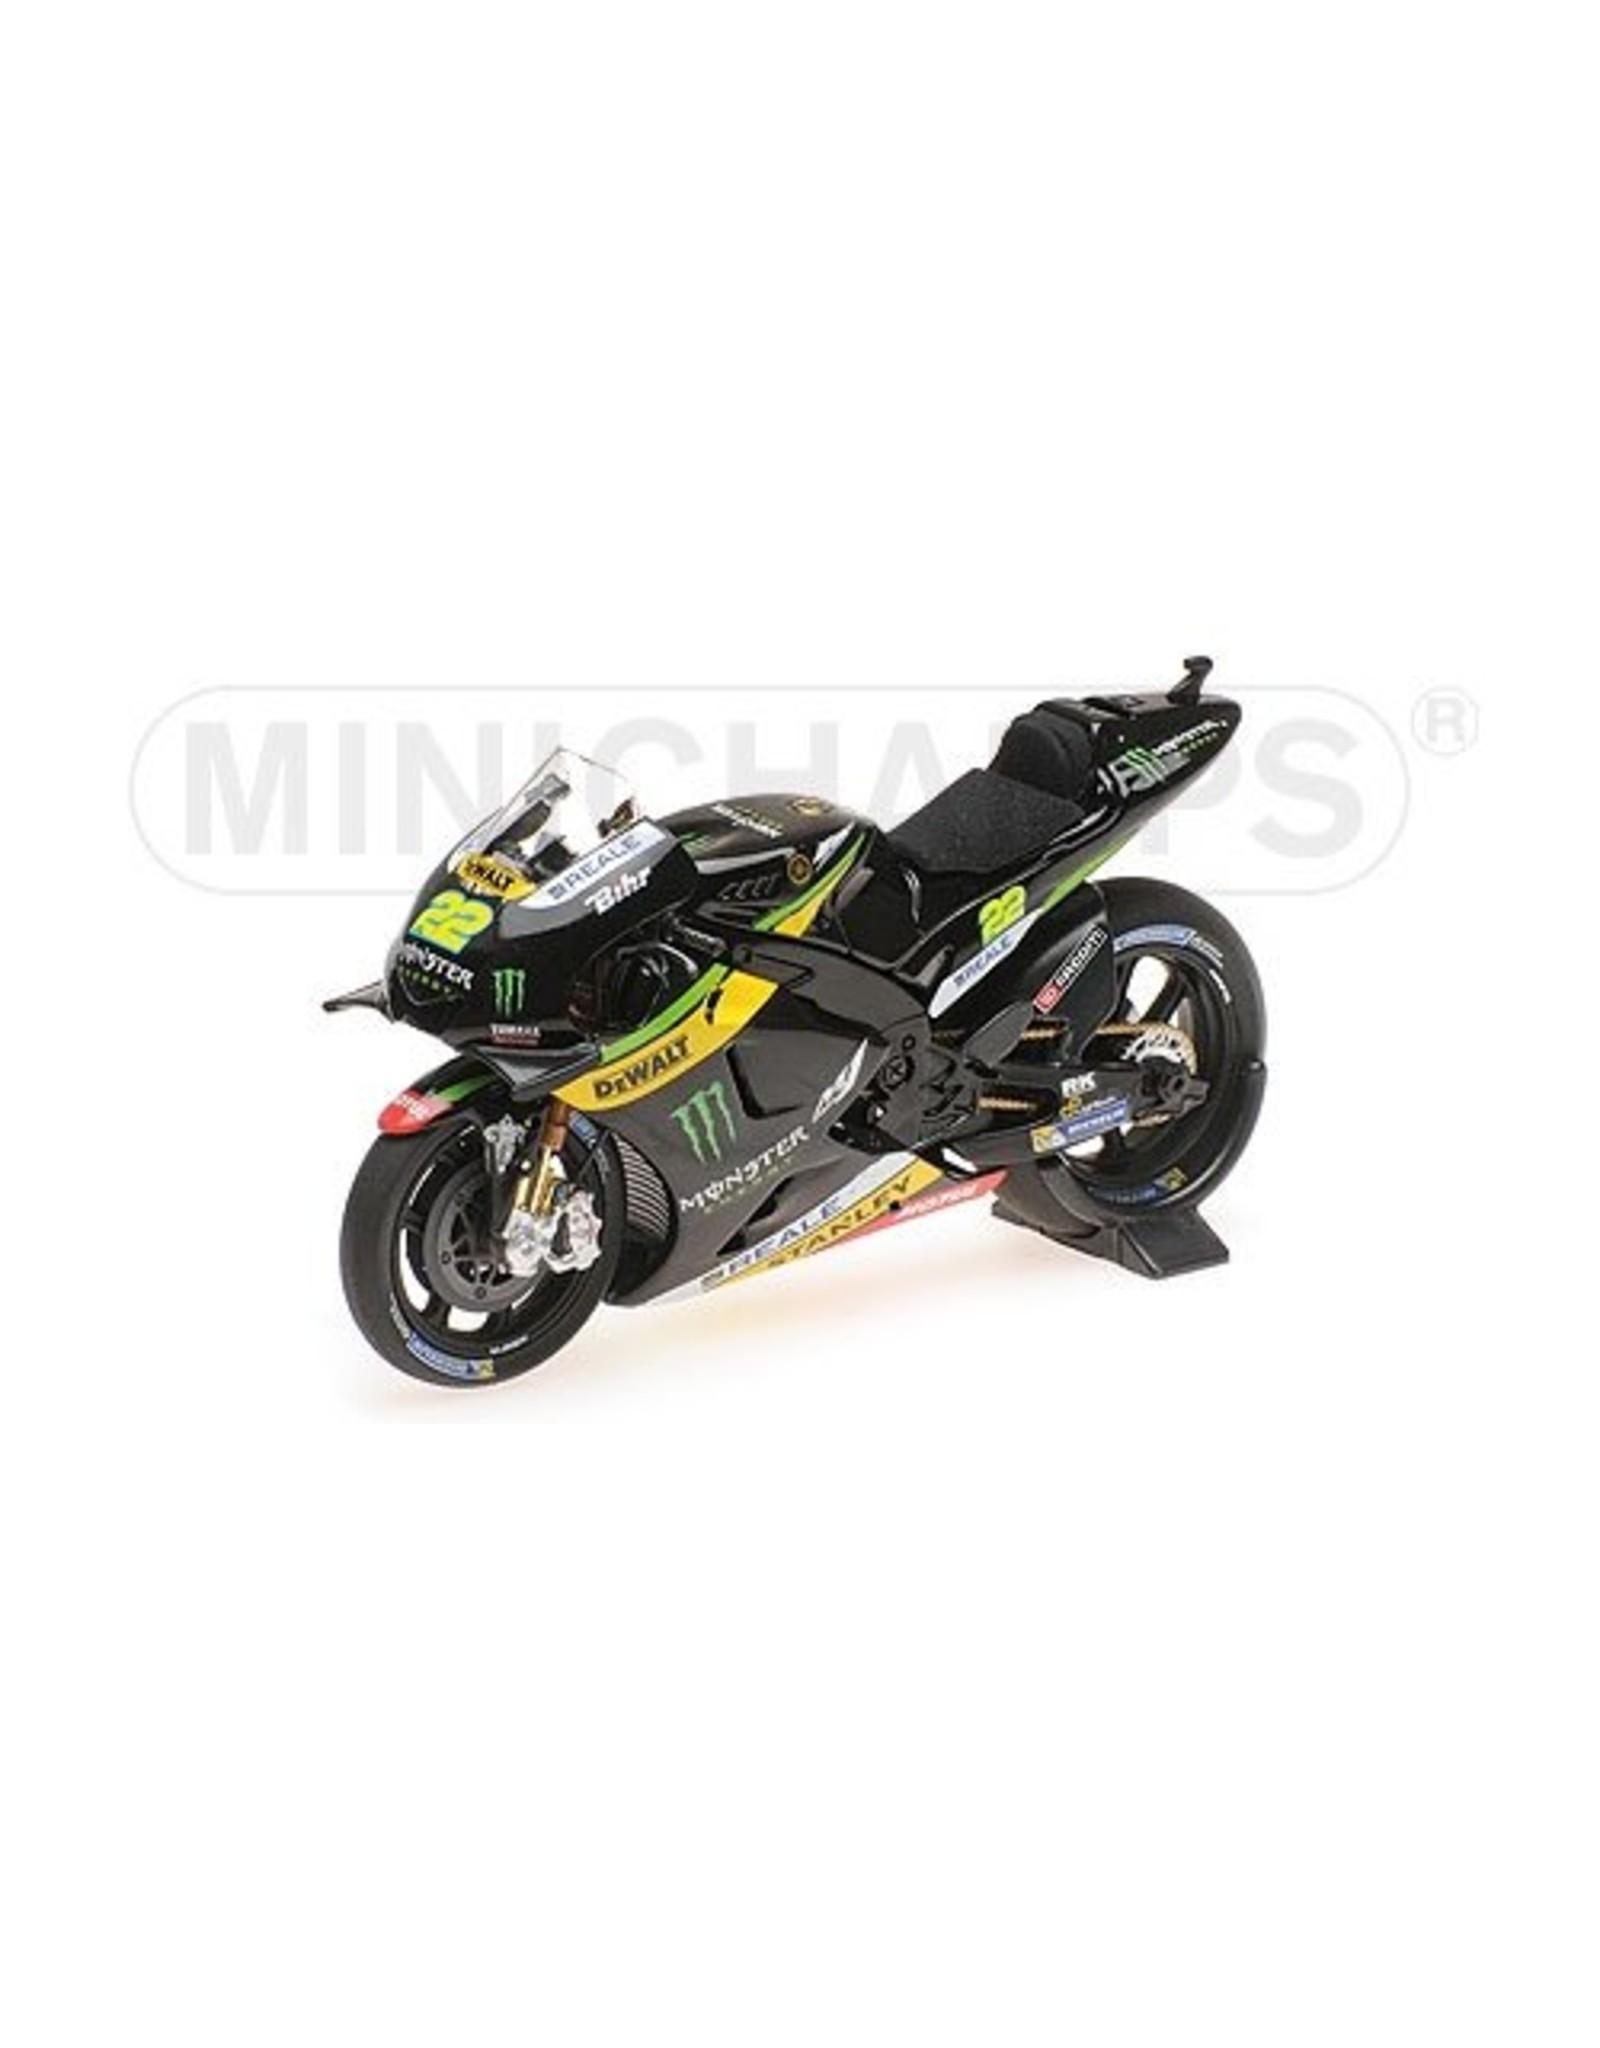 Yamaha Yamaha YZR-M1 Monster Yamaha Tech3 #22 MotoGP 2016 - 1:18 - Minichamps